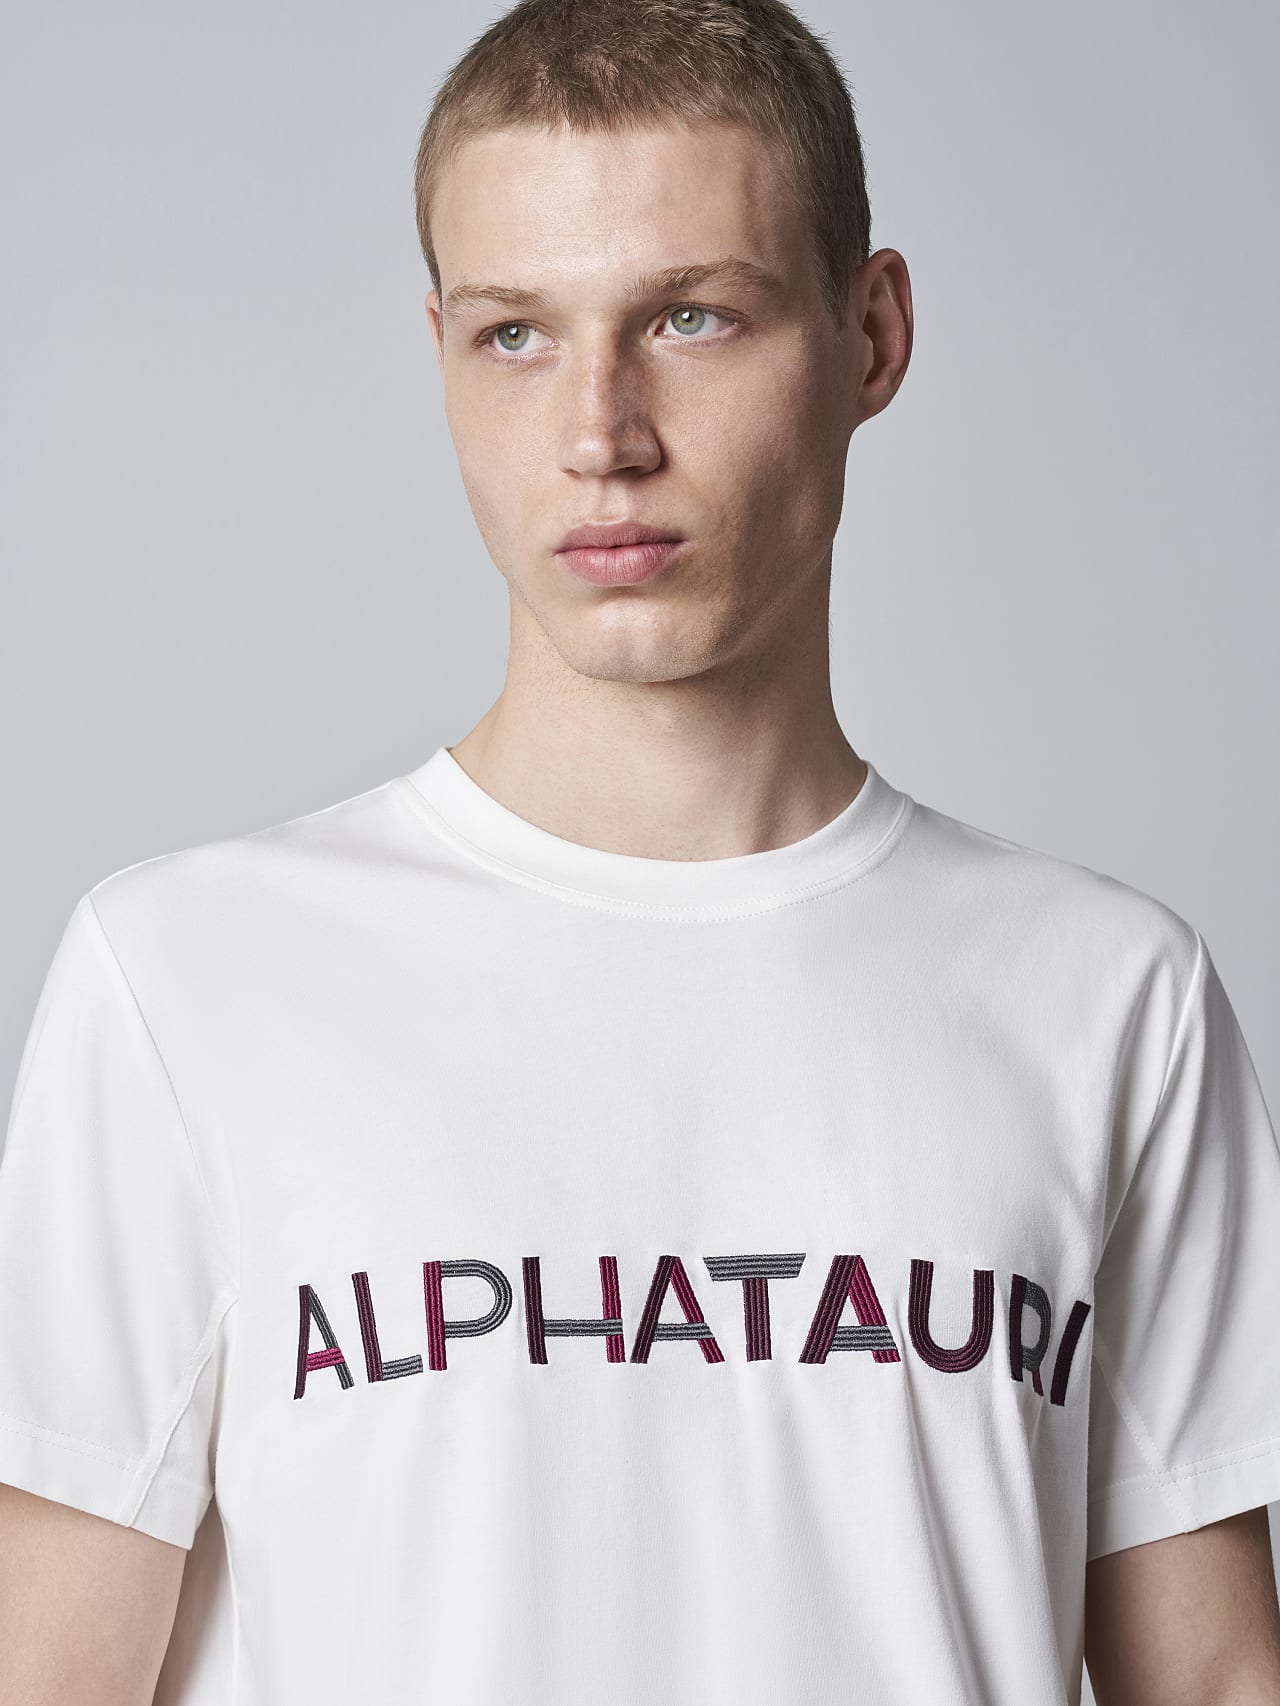 JANOS V3.Y5.02 Logo Embroidery T-Shirt offwhite Model shot Alpha Tauri